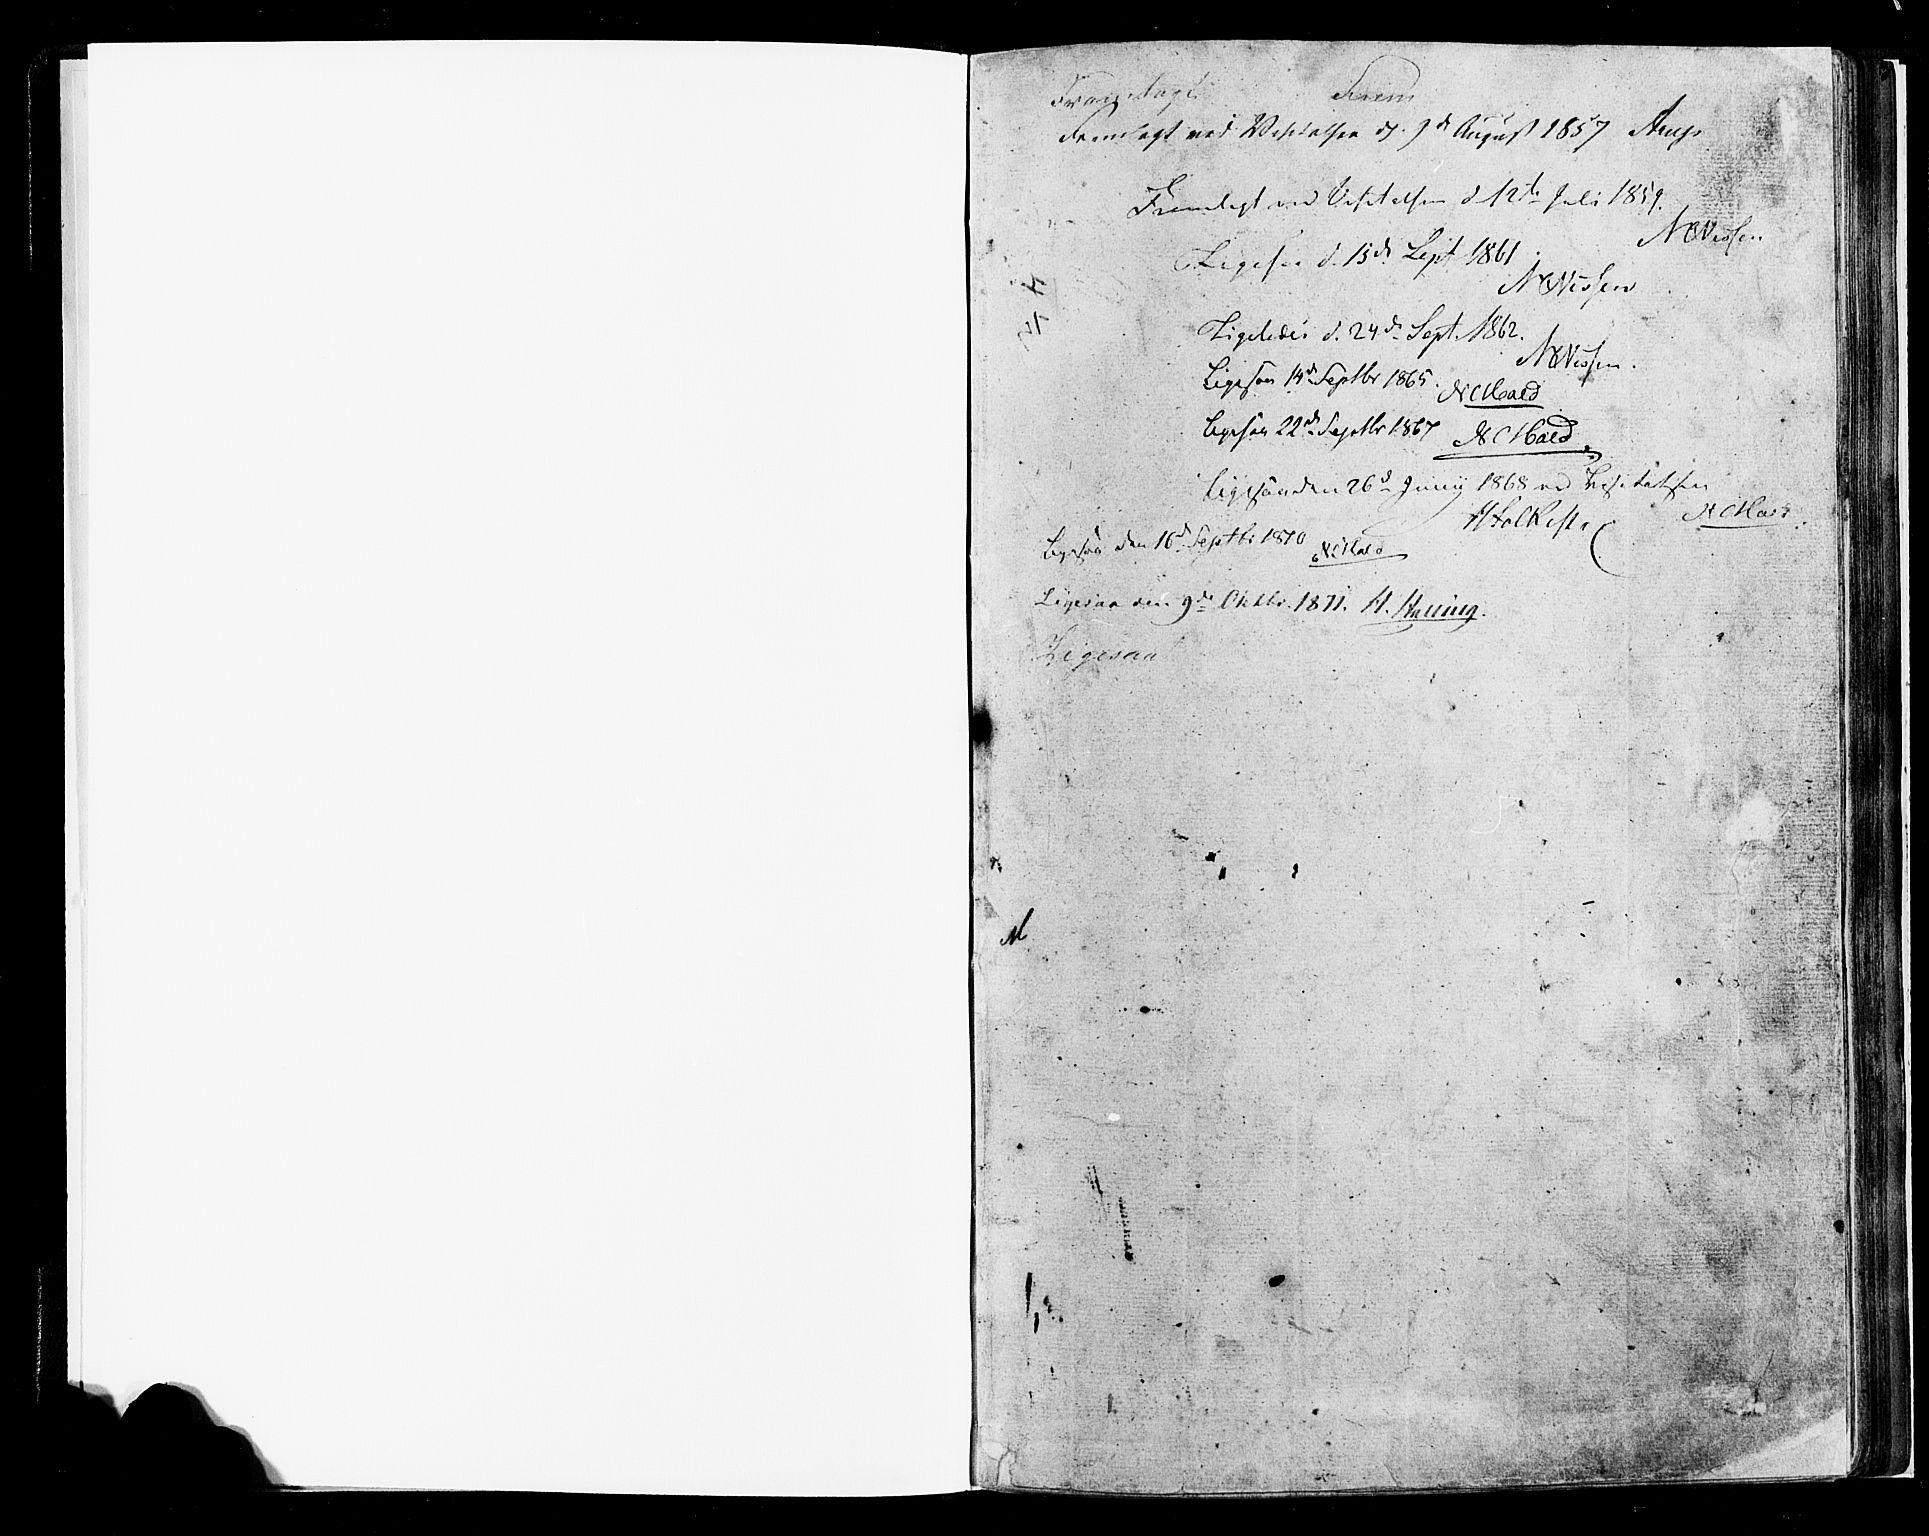 SAH, Lesja prestekontor, Klokkerbok nr. 4, 1842-1871